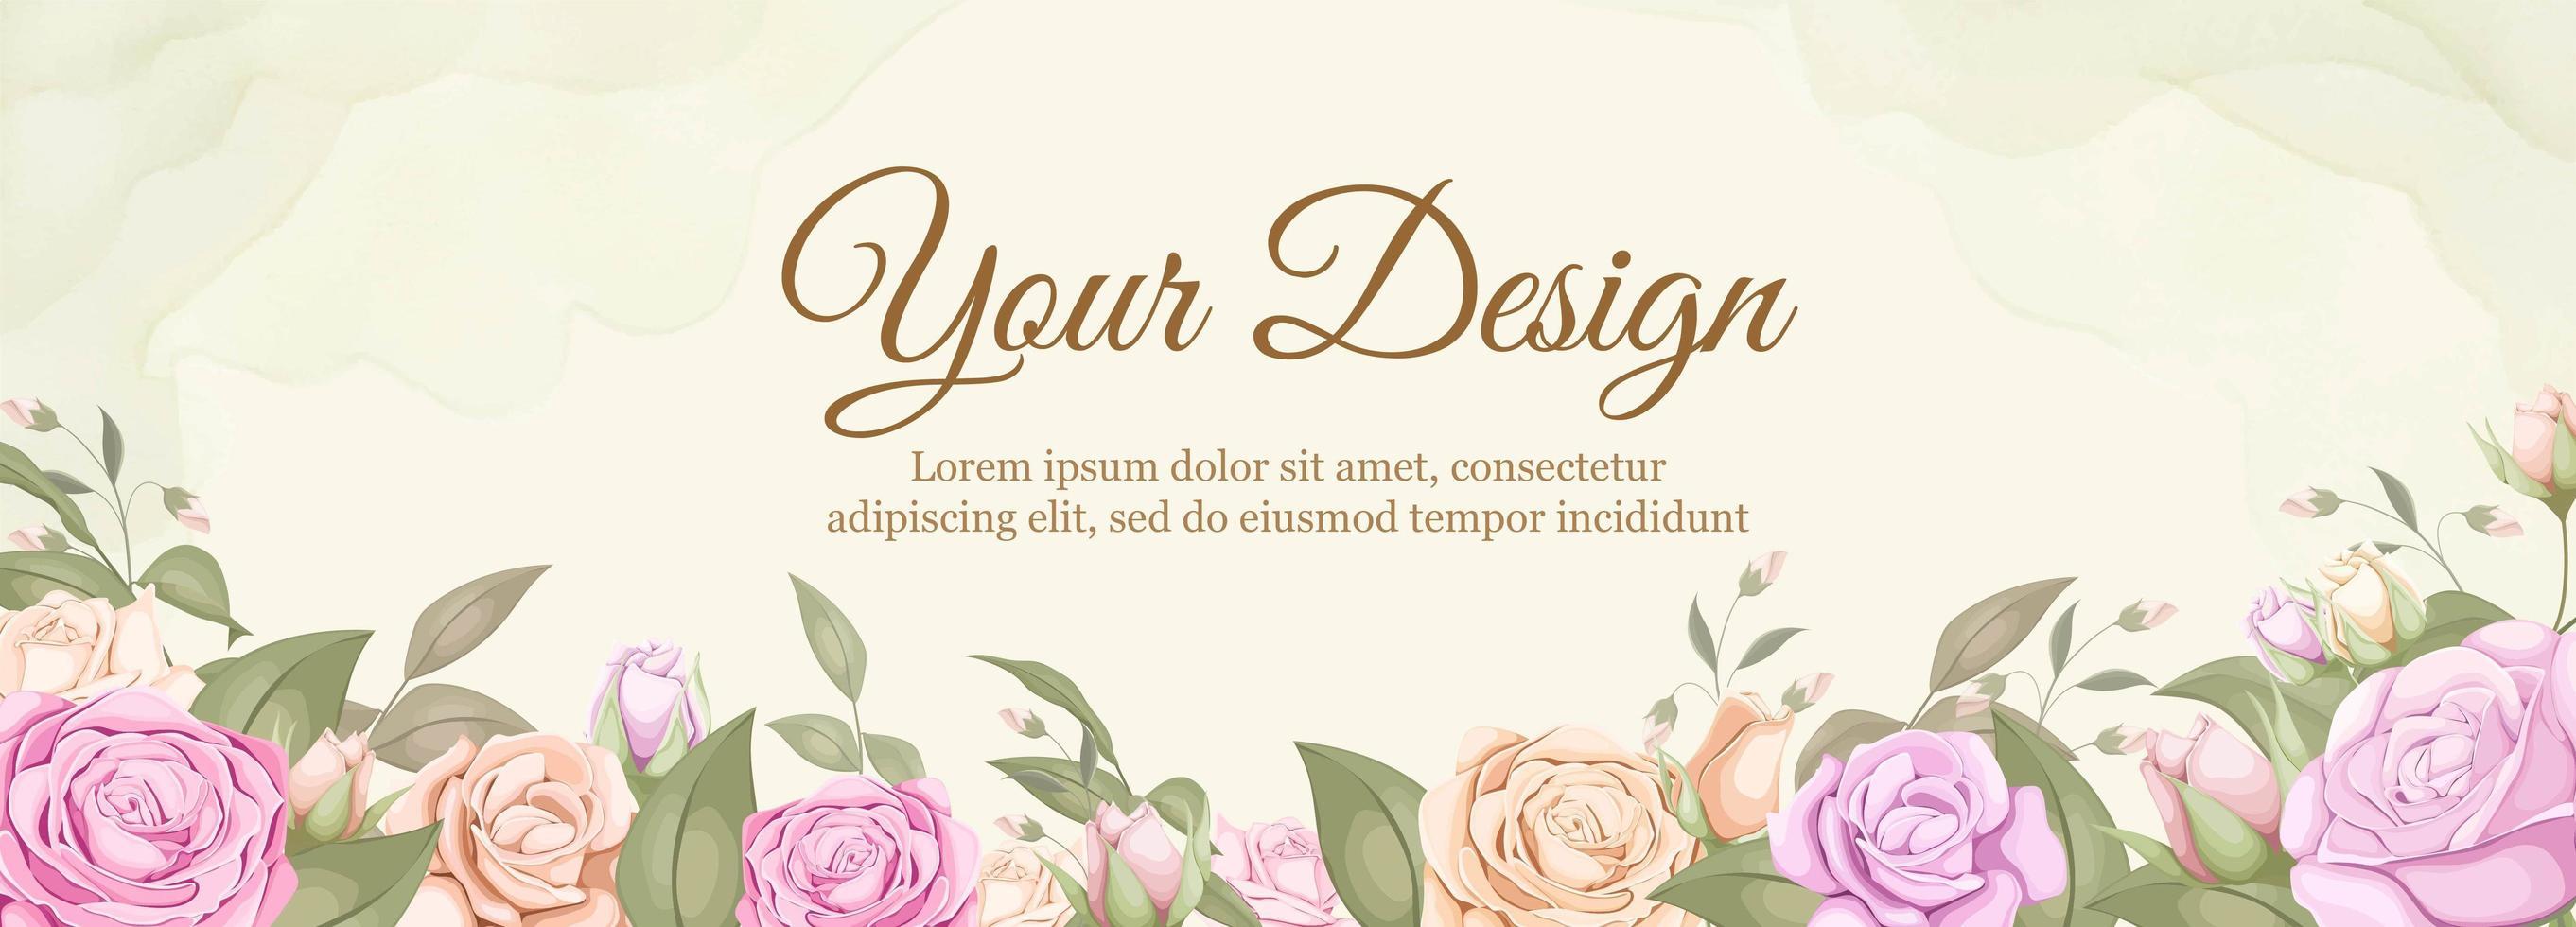 Rose Wedding Banner Download Free Vectors Clipart Graphics Vector Art